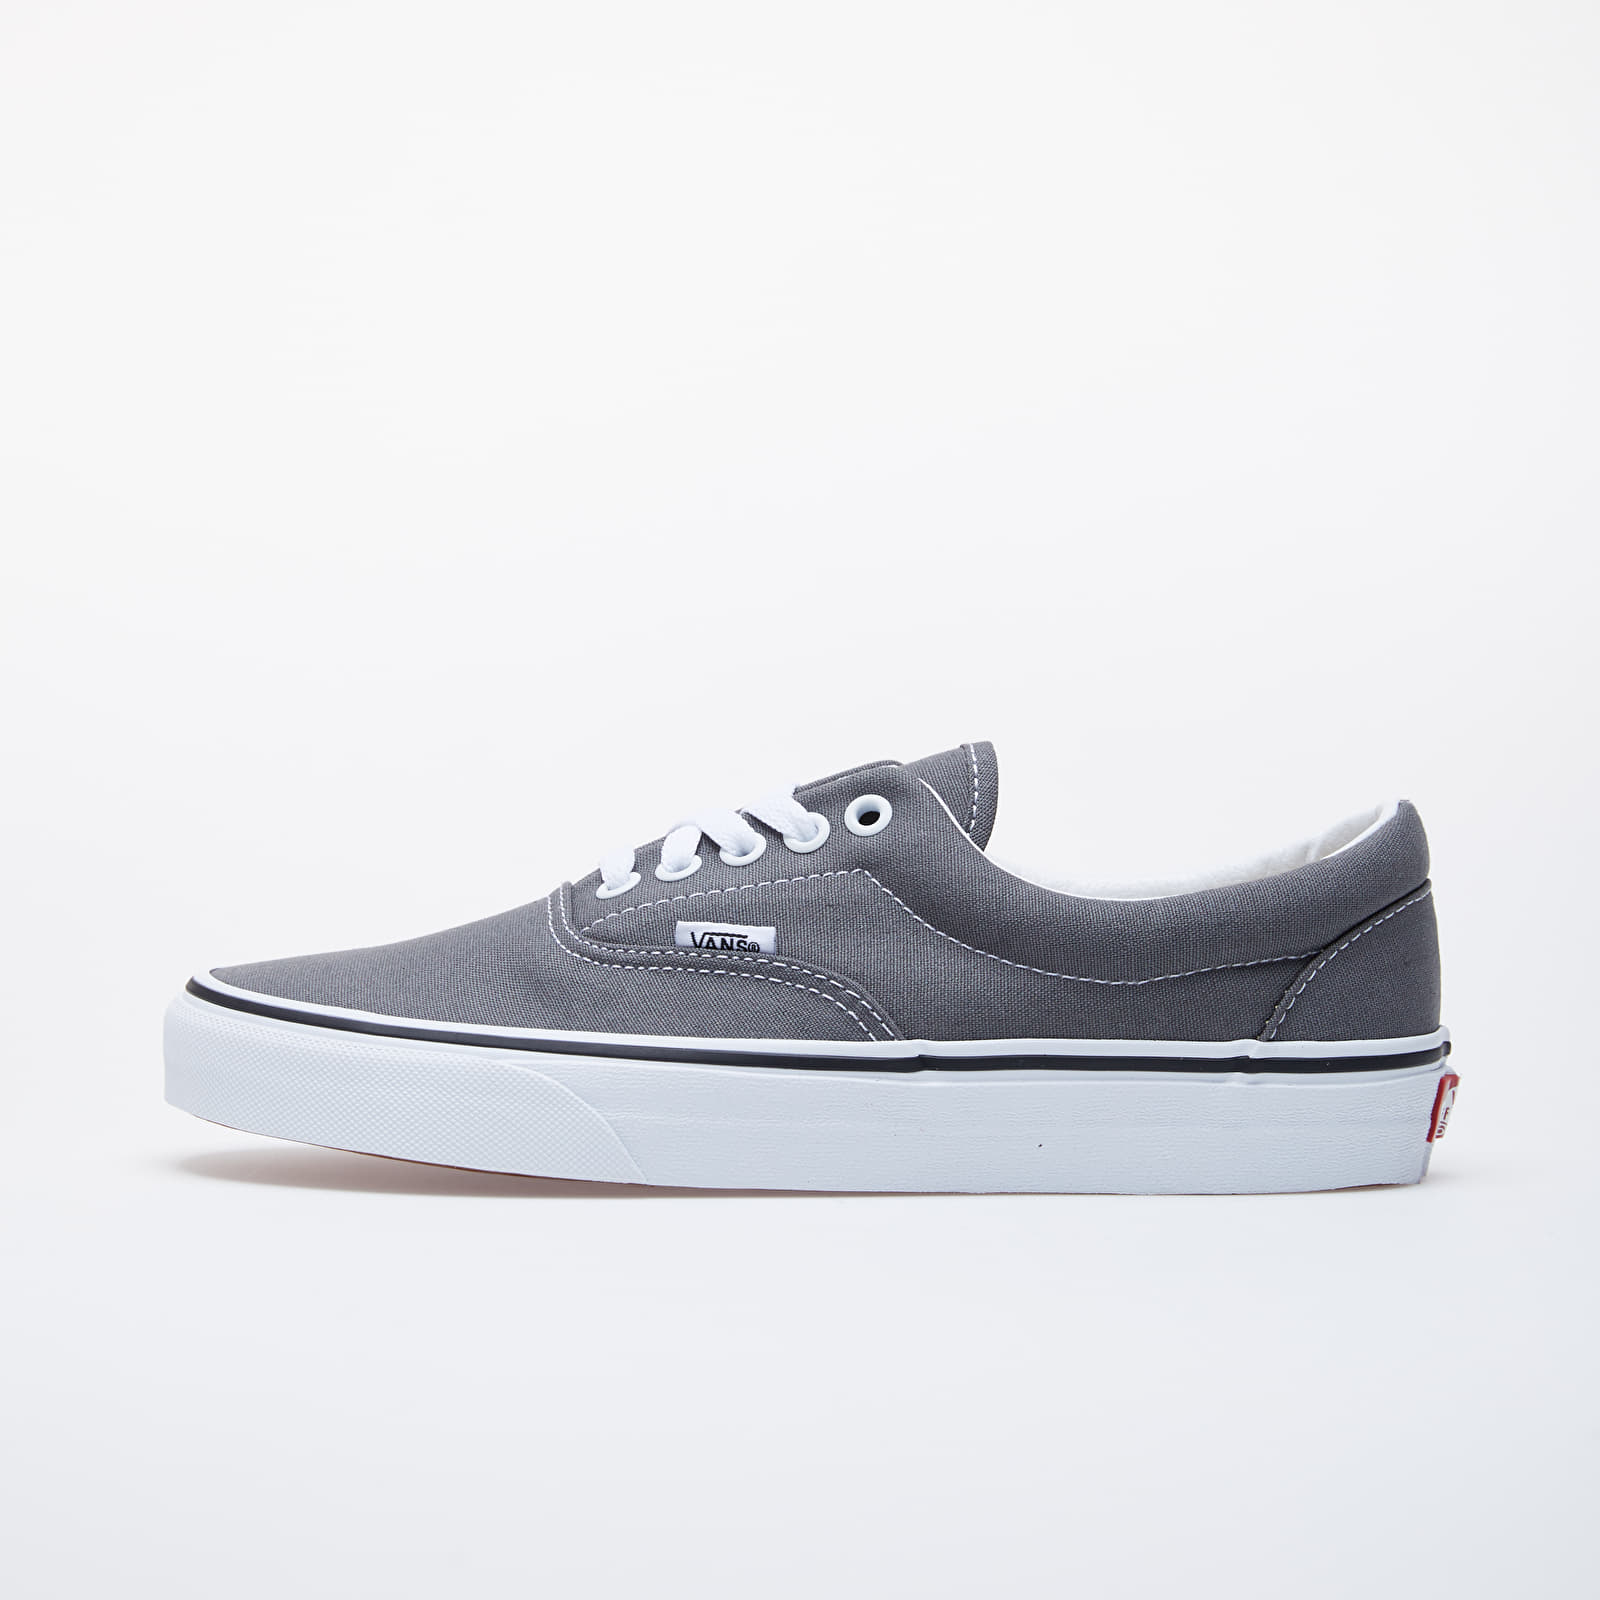 Men's shoes Vans Era Pewter/ True White